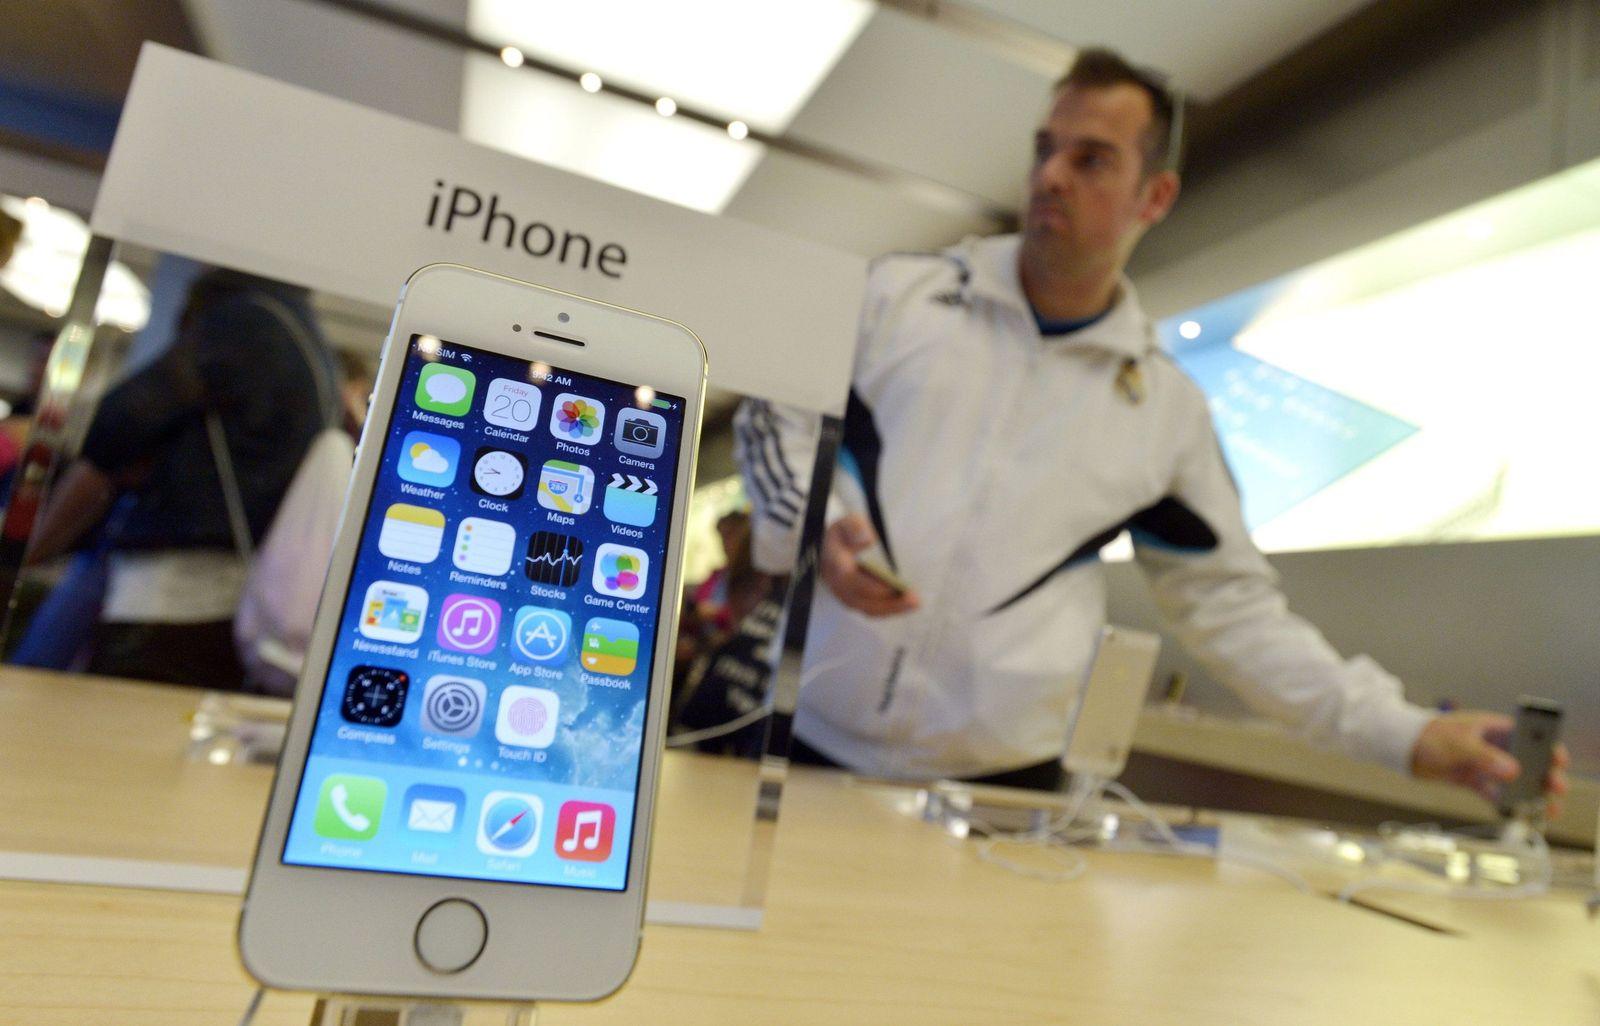 Neue iPhones von Apple 5s